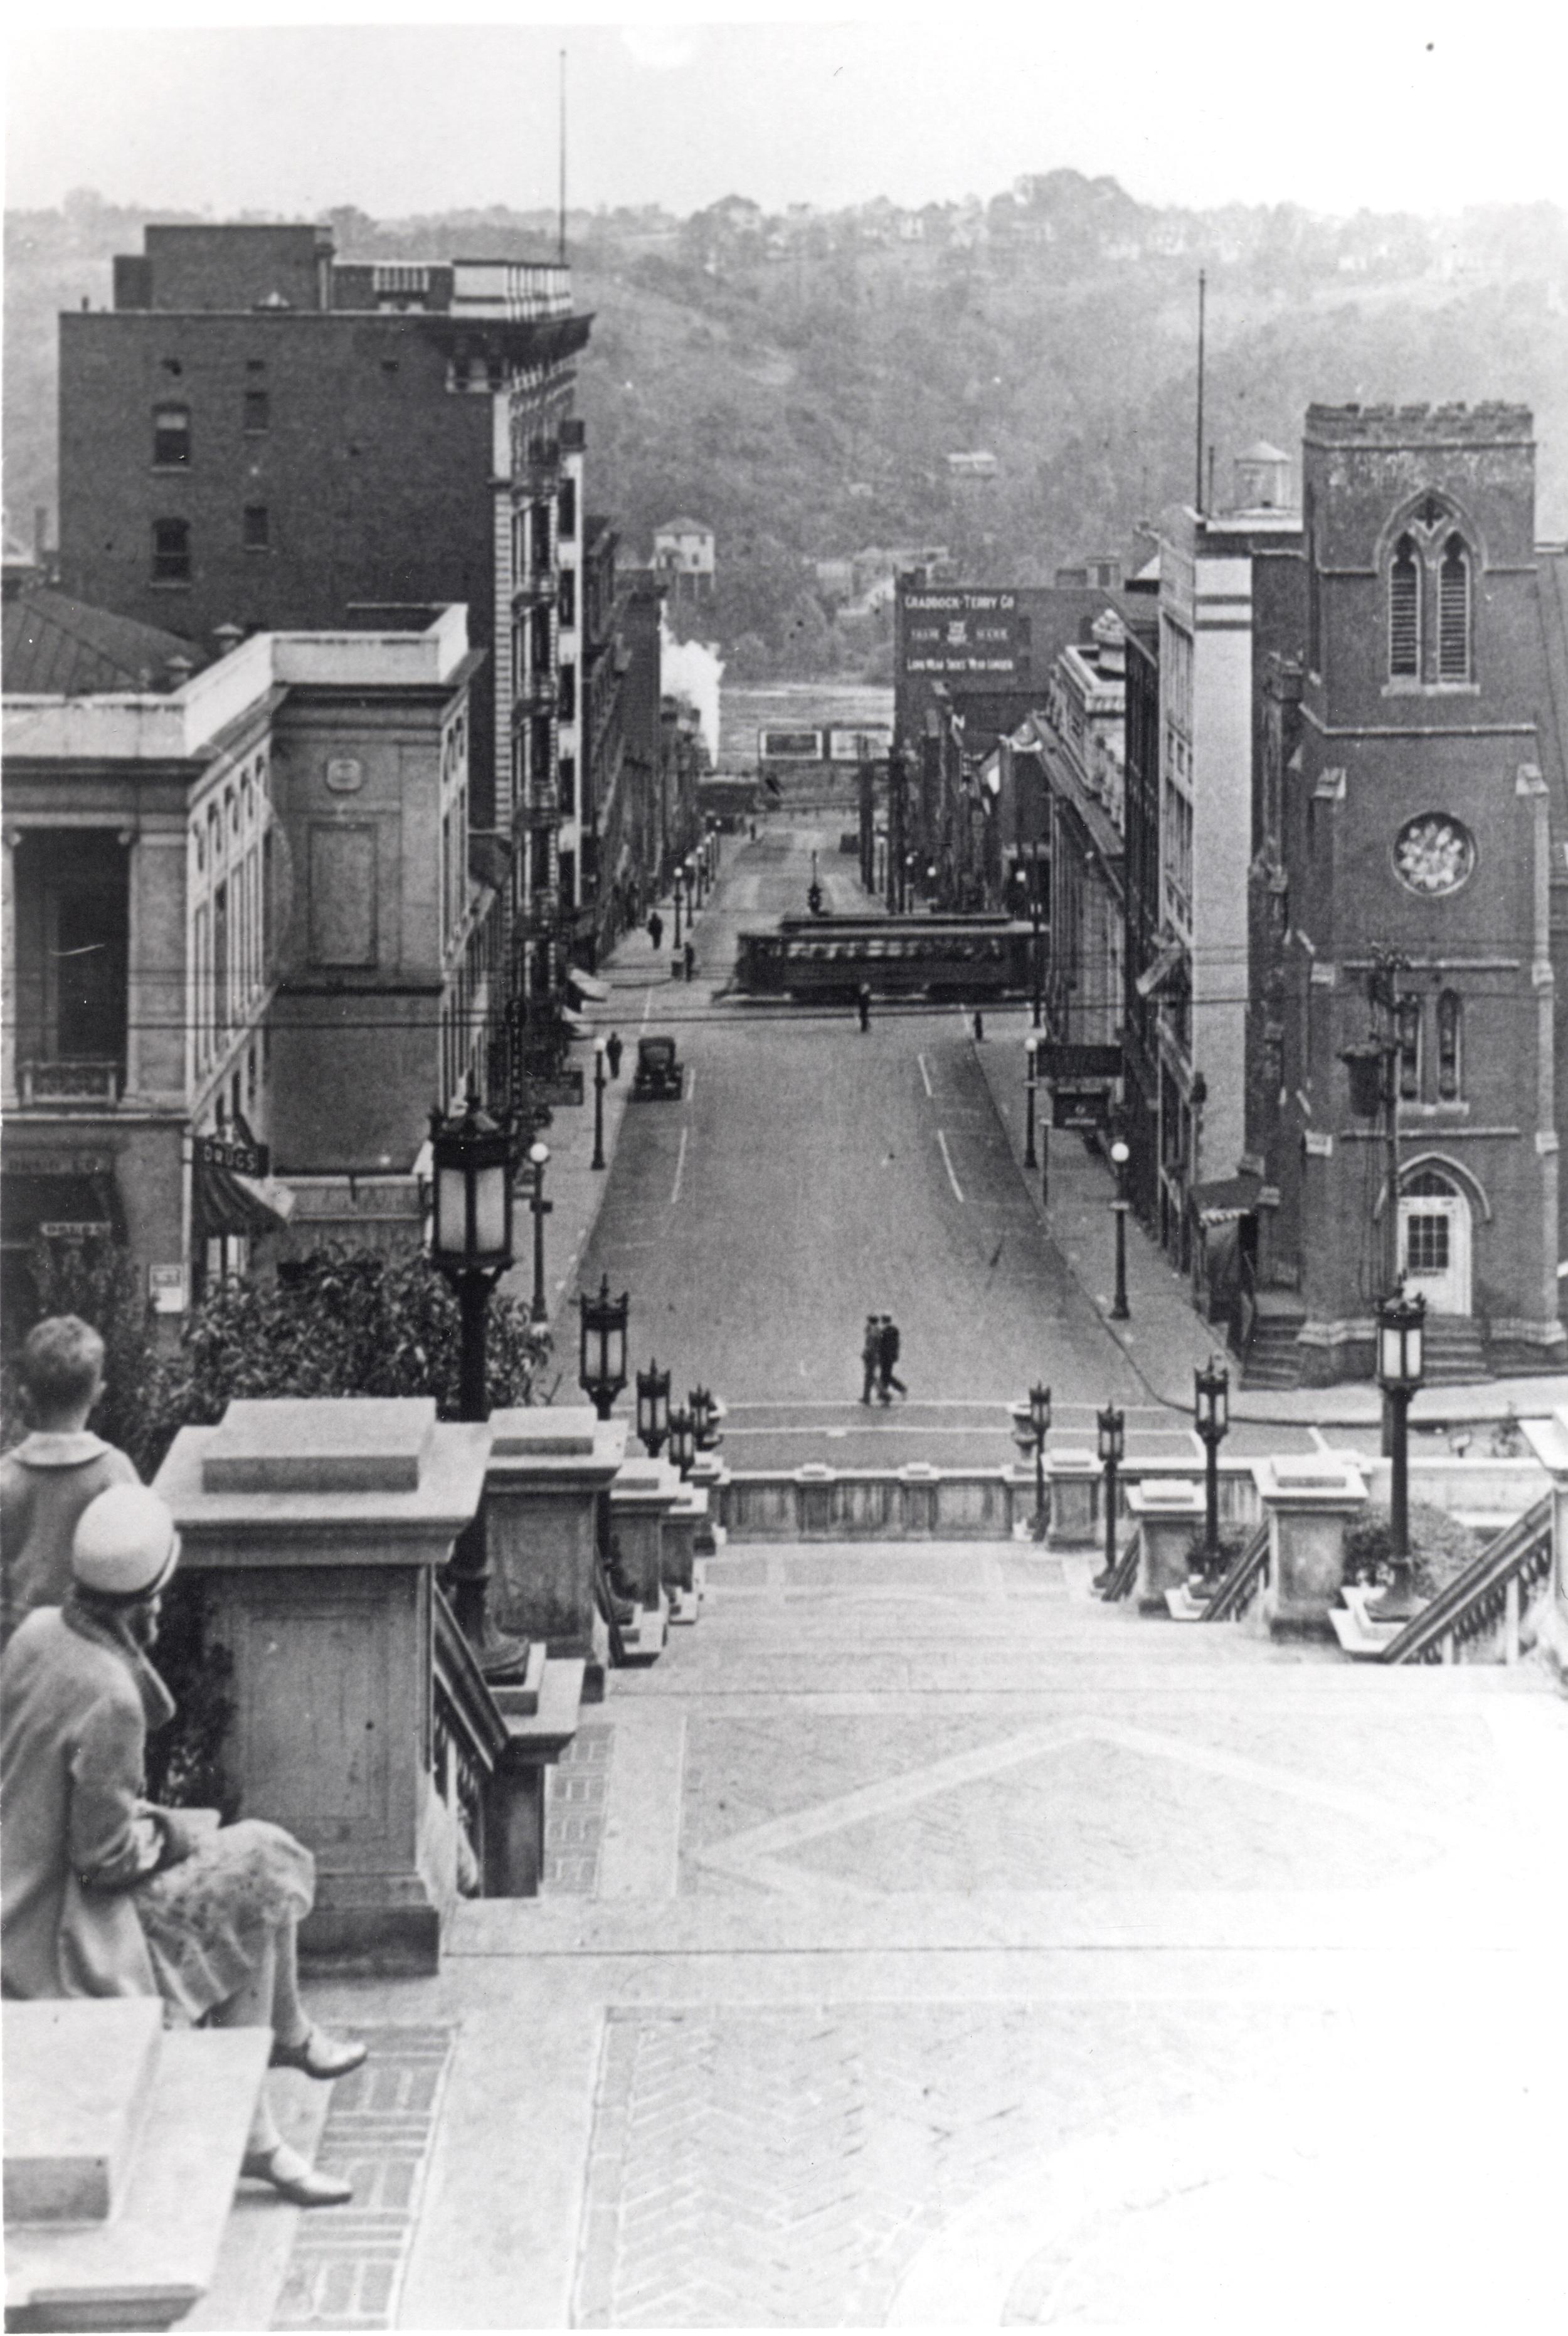 Looking Down 9th Street post 1926